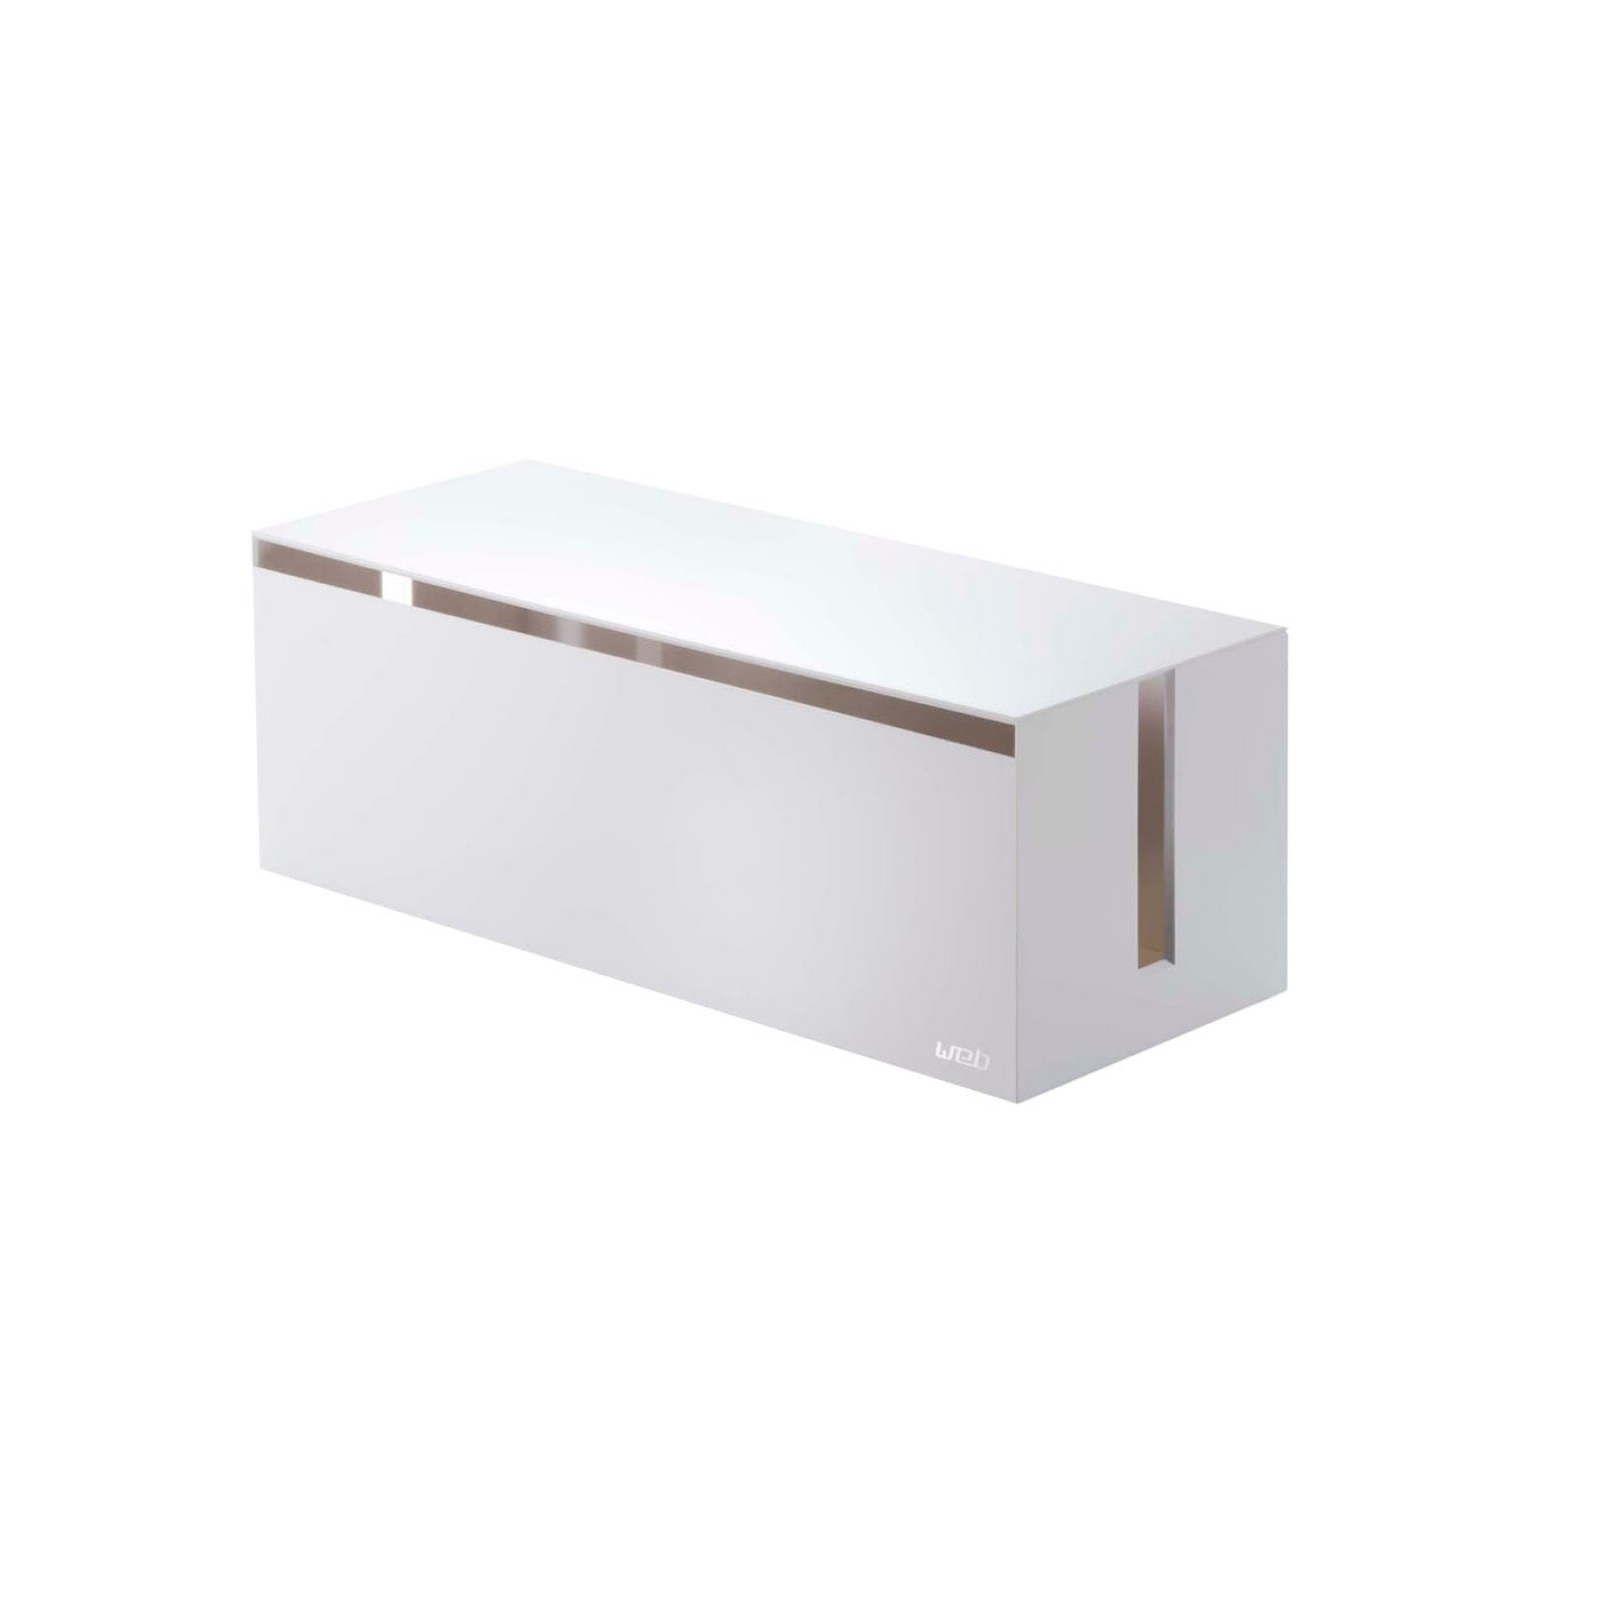 Web Κουτί για Οργάνωση Καλωδίων (Λευκό) - Yamazaki